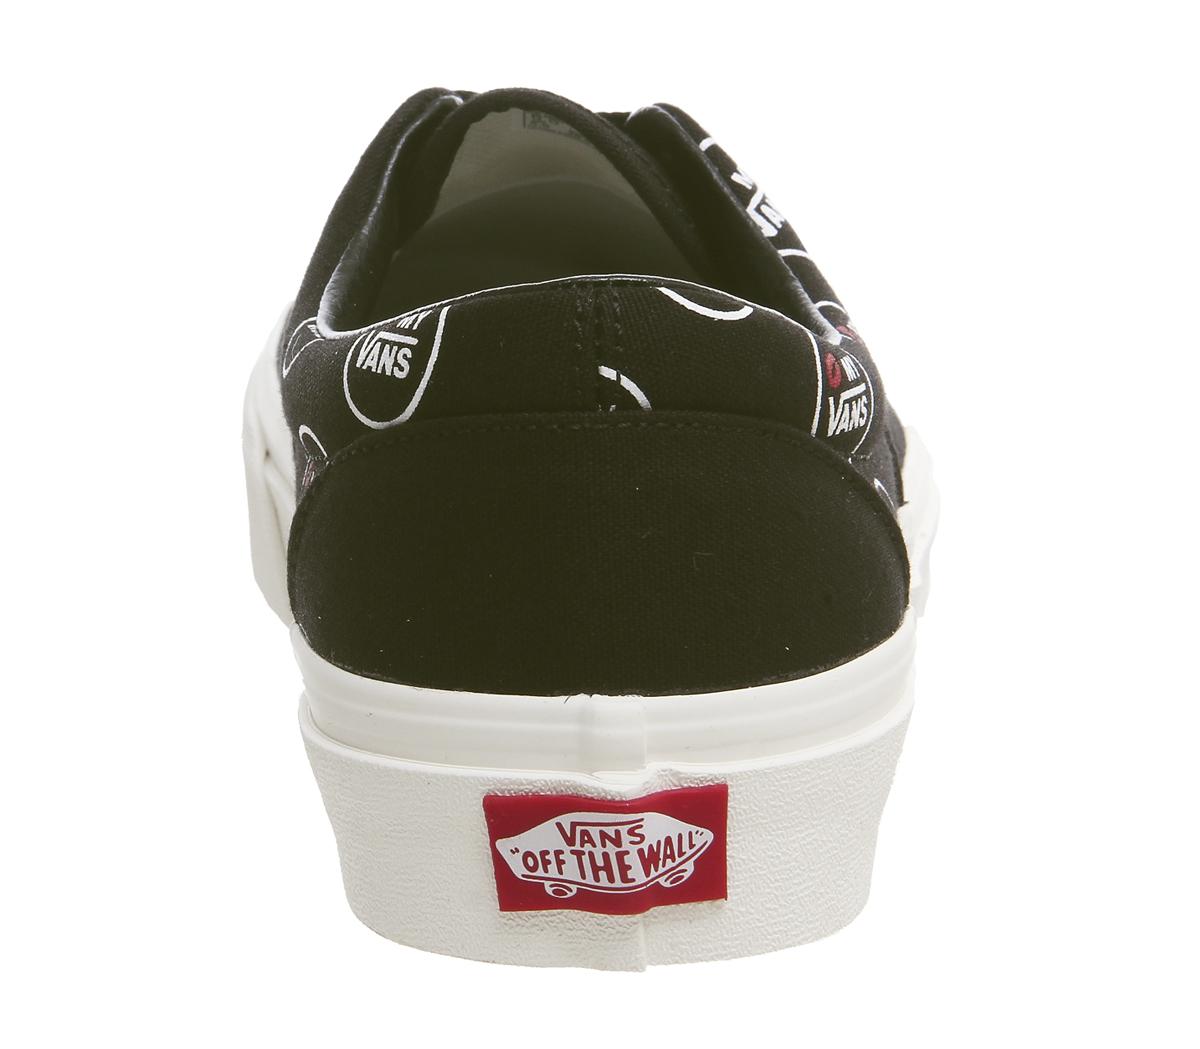 KMV Uomo Vans Era Trainers KMV  BLACK MARSHMELLOW Trainers Schuhes 1b11aa